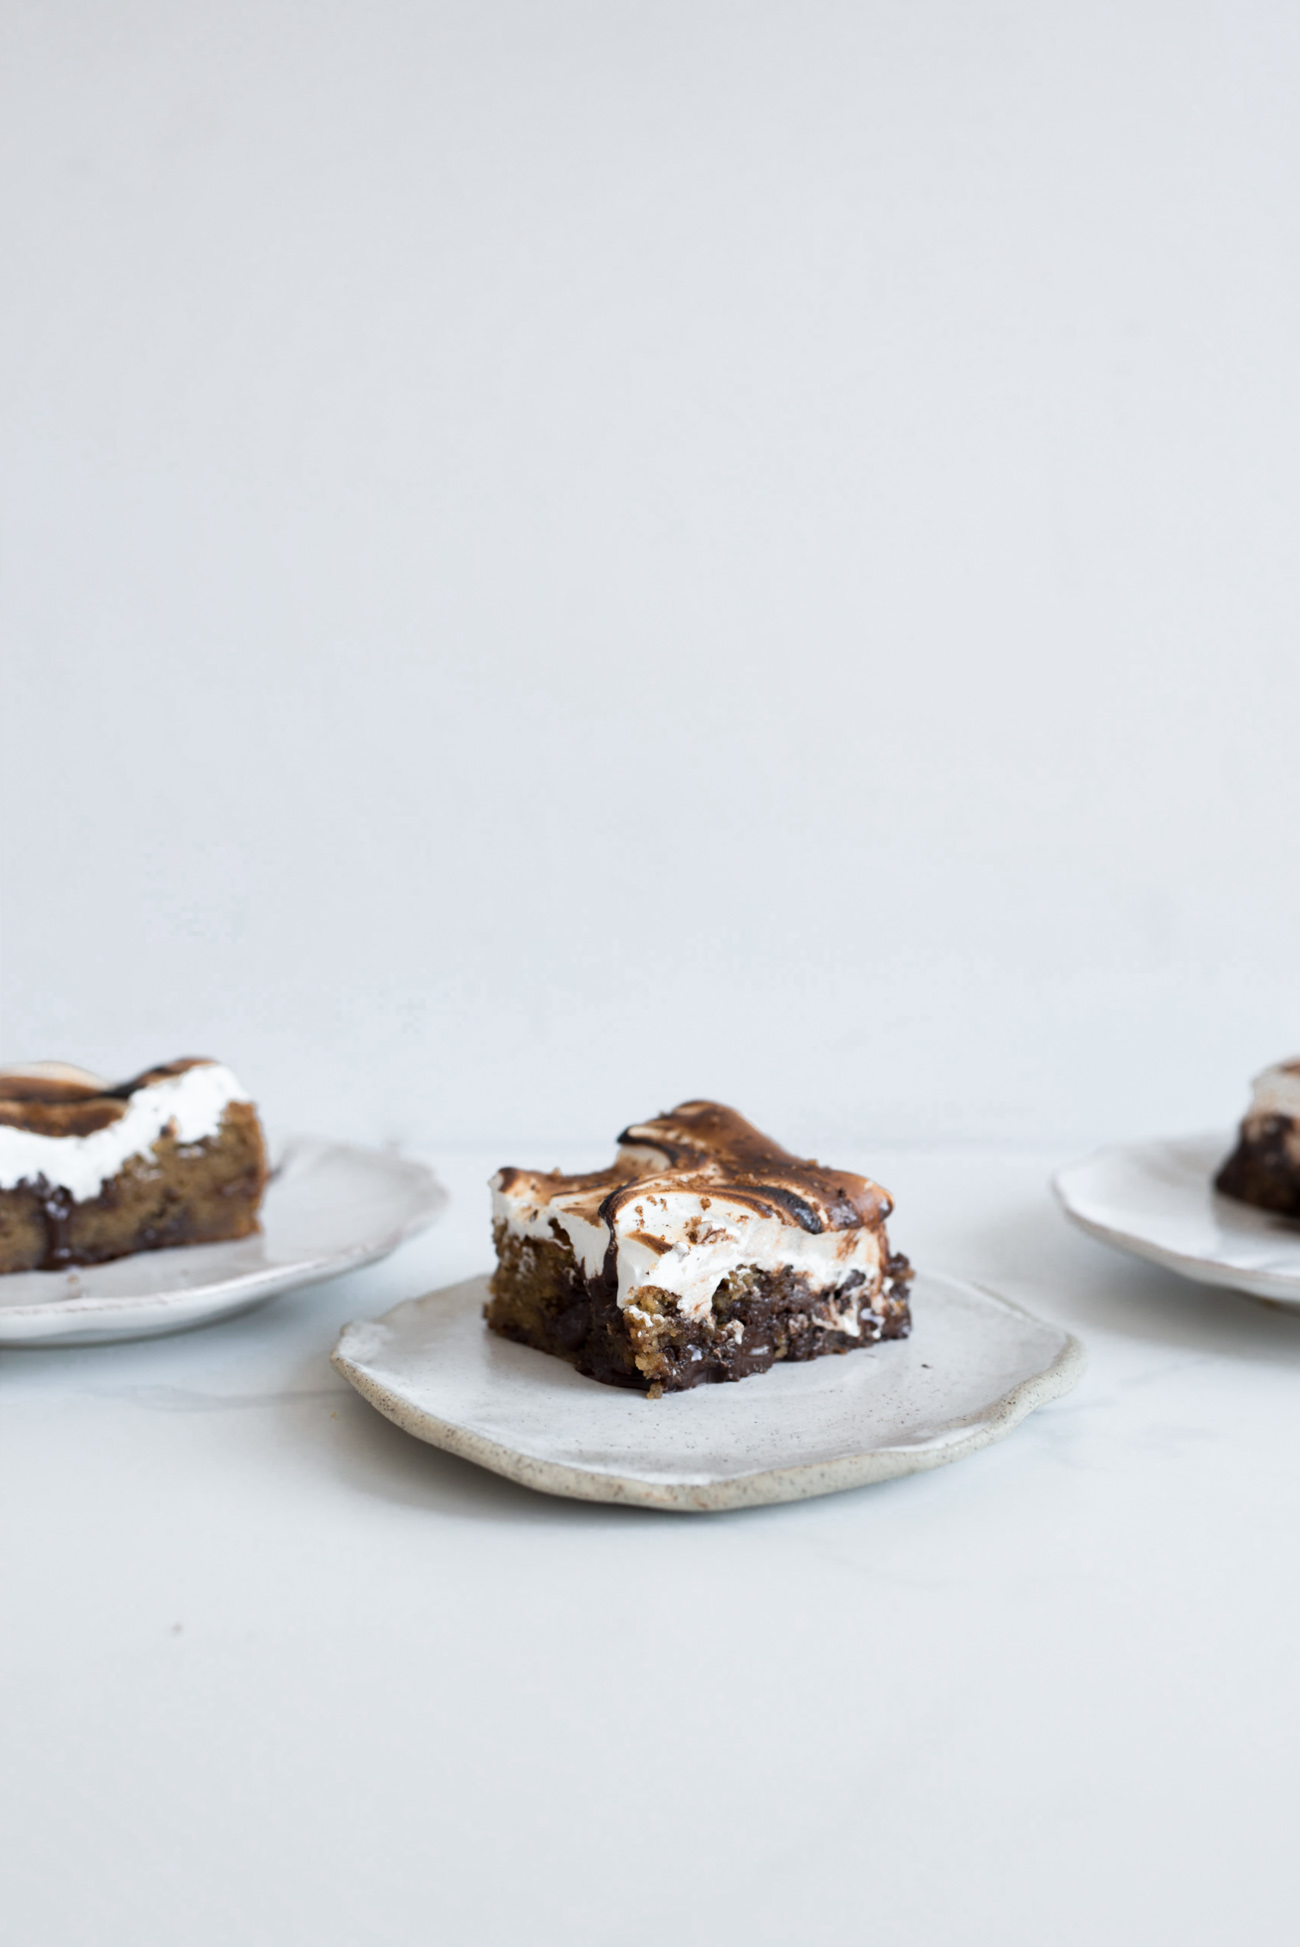 Brown-Butter-Cookie-Meringue-Bars-with-Espresso-Fleur-de-Sel-7.jpg